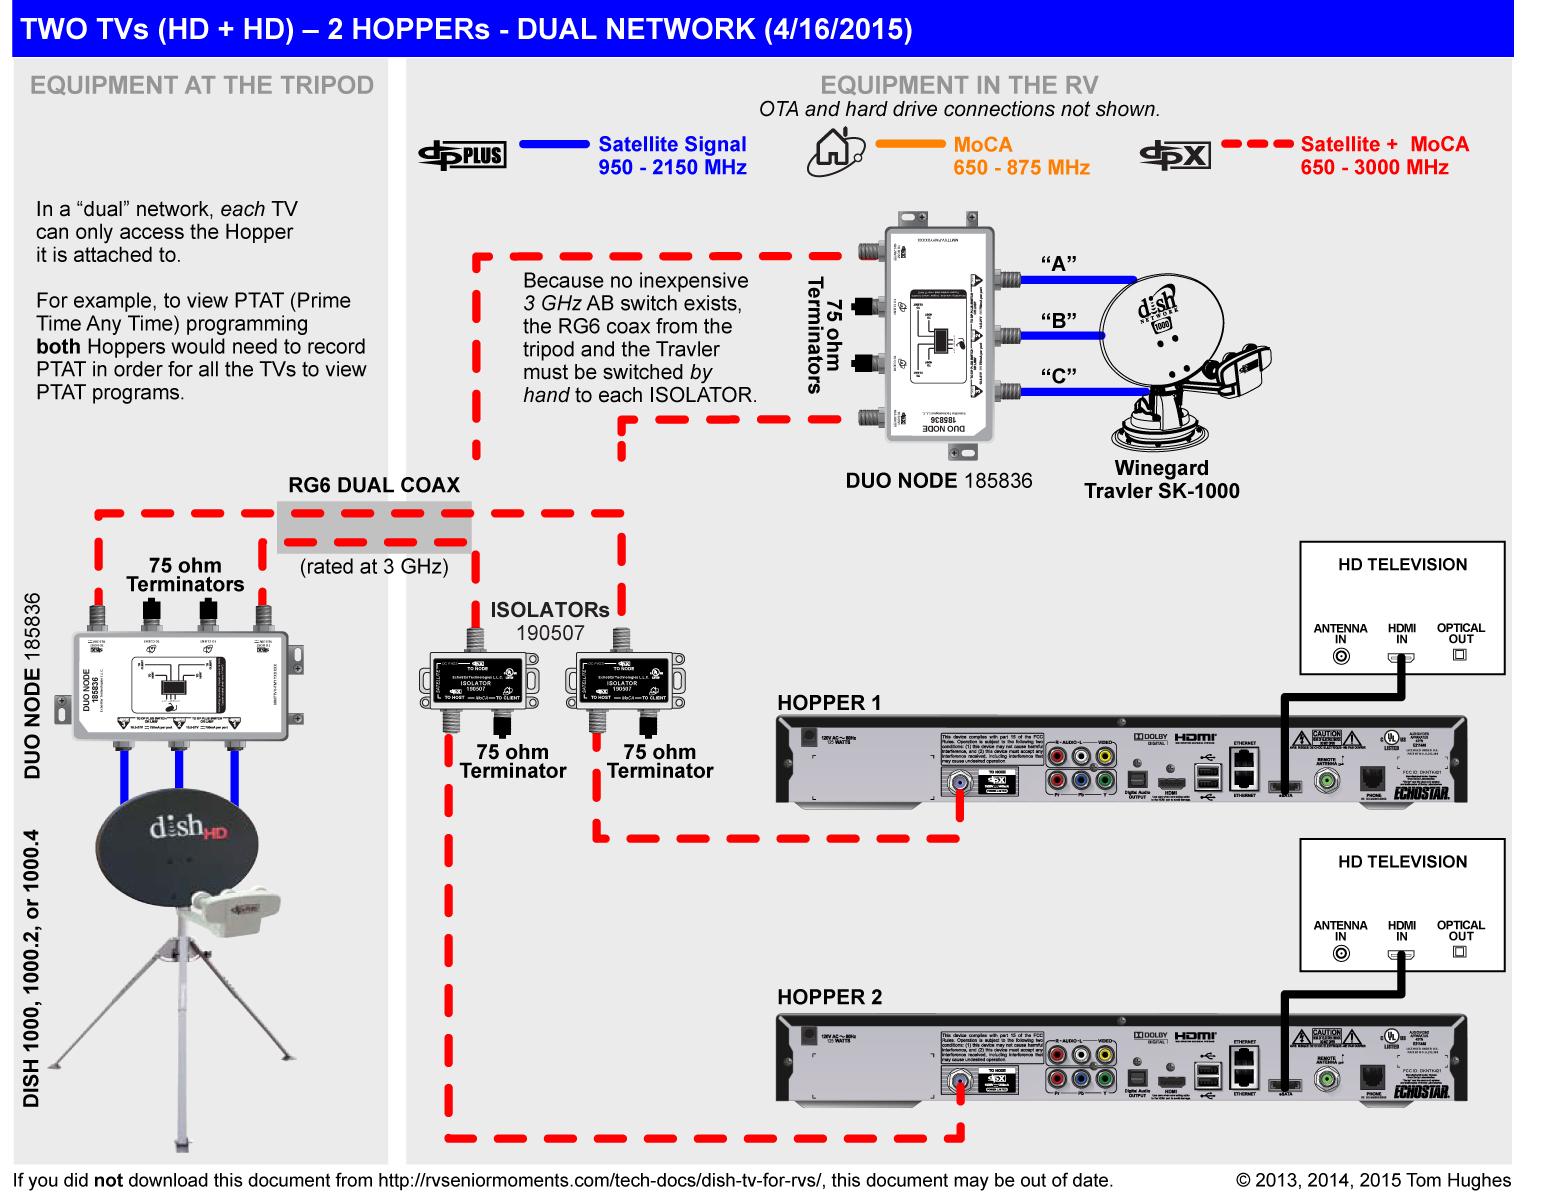 dish network wiring diagrams turntable cartridge diagram dual receiver 41